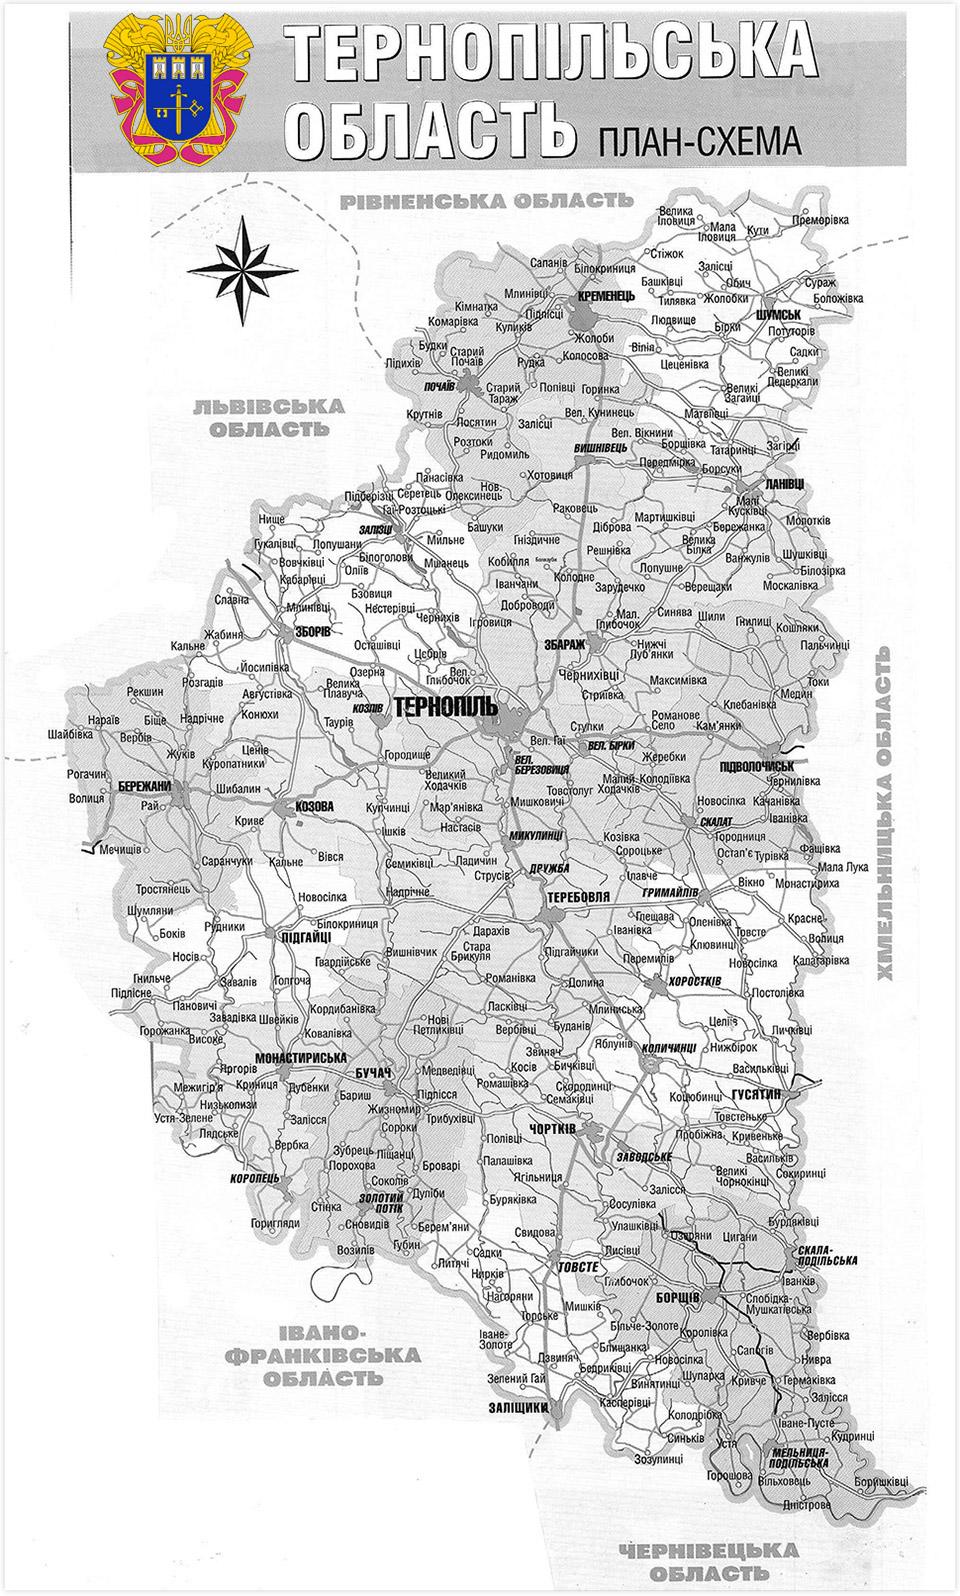 Сучасна карта Тернопільськї області